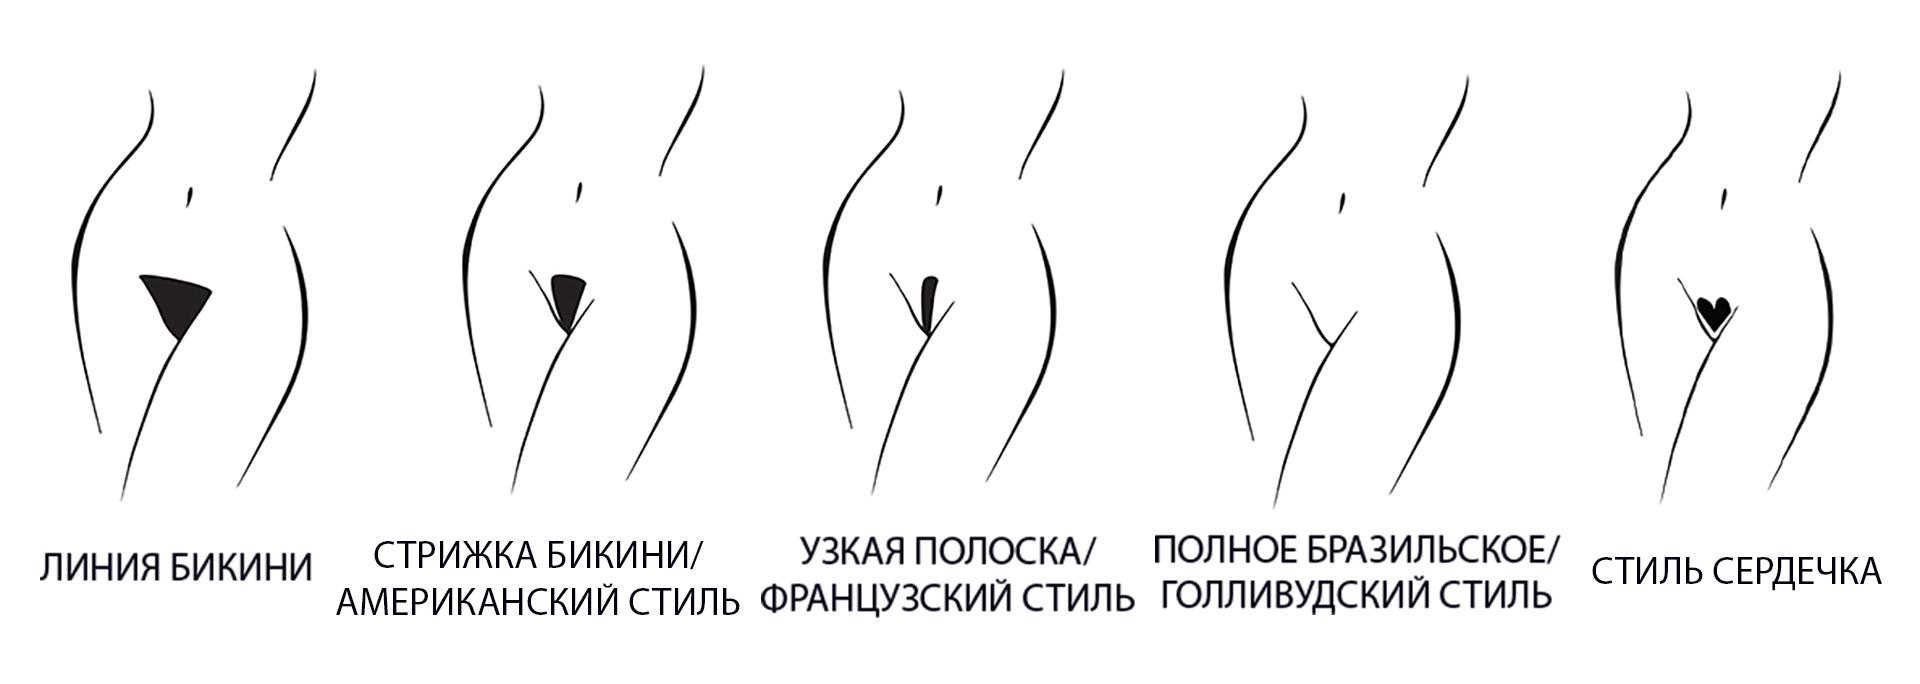 Виды бикини